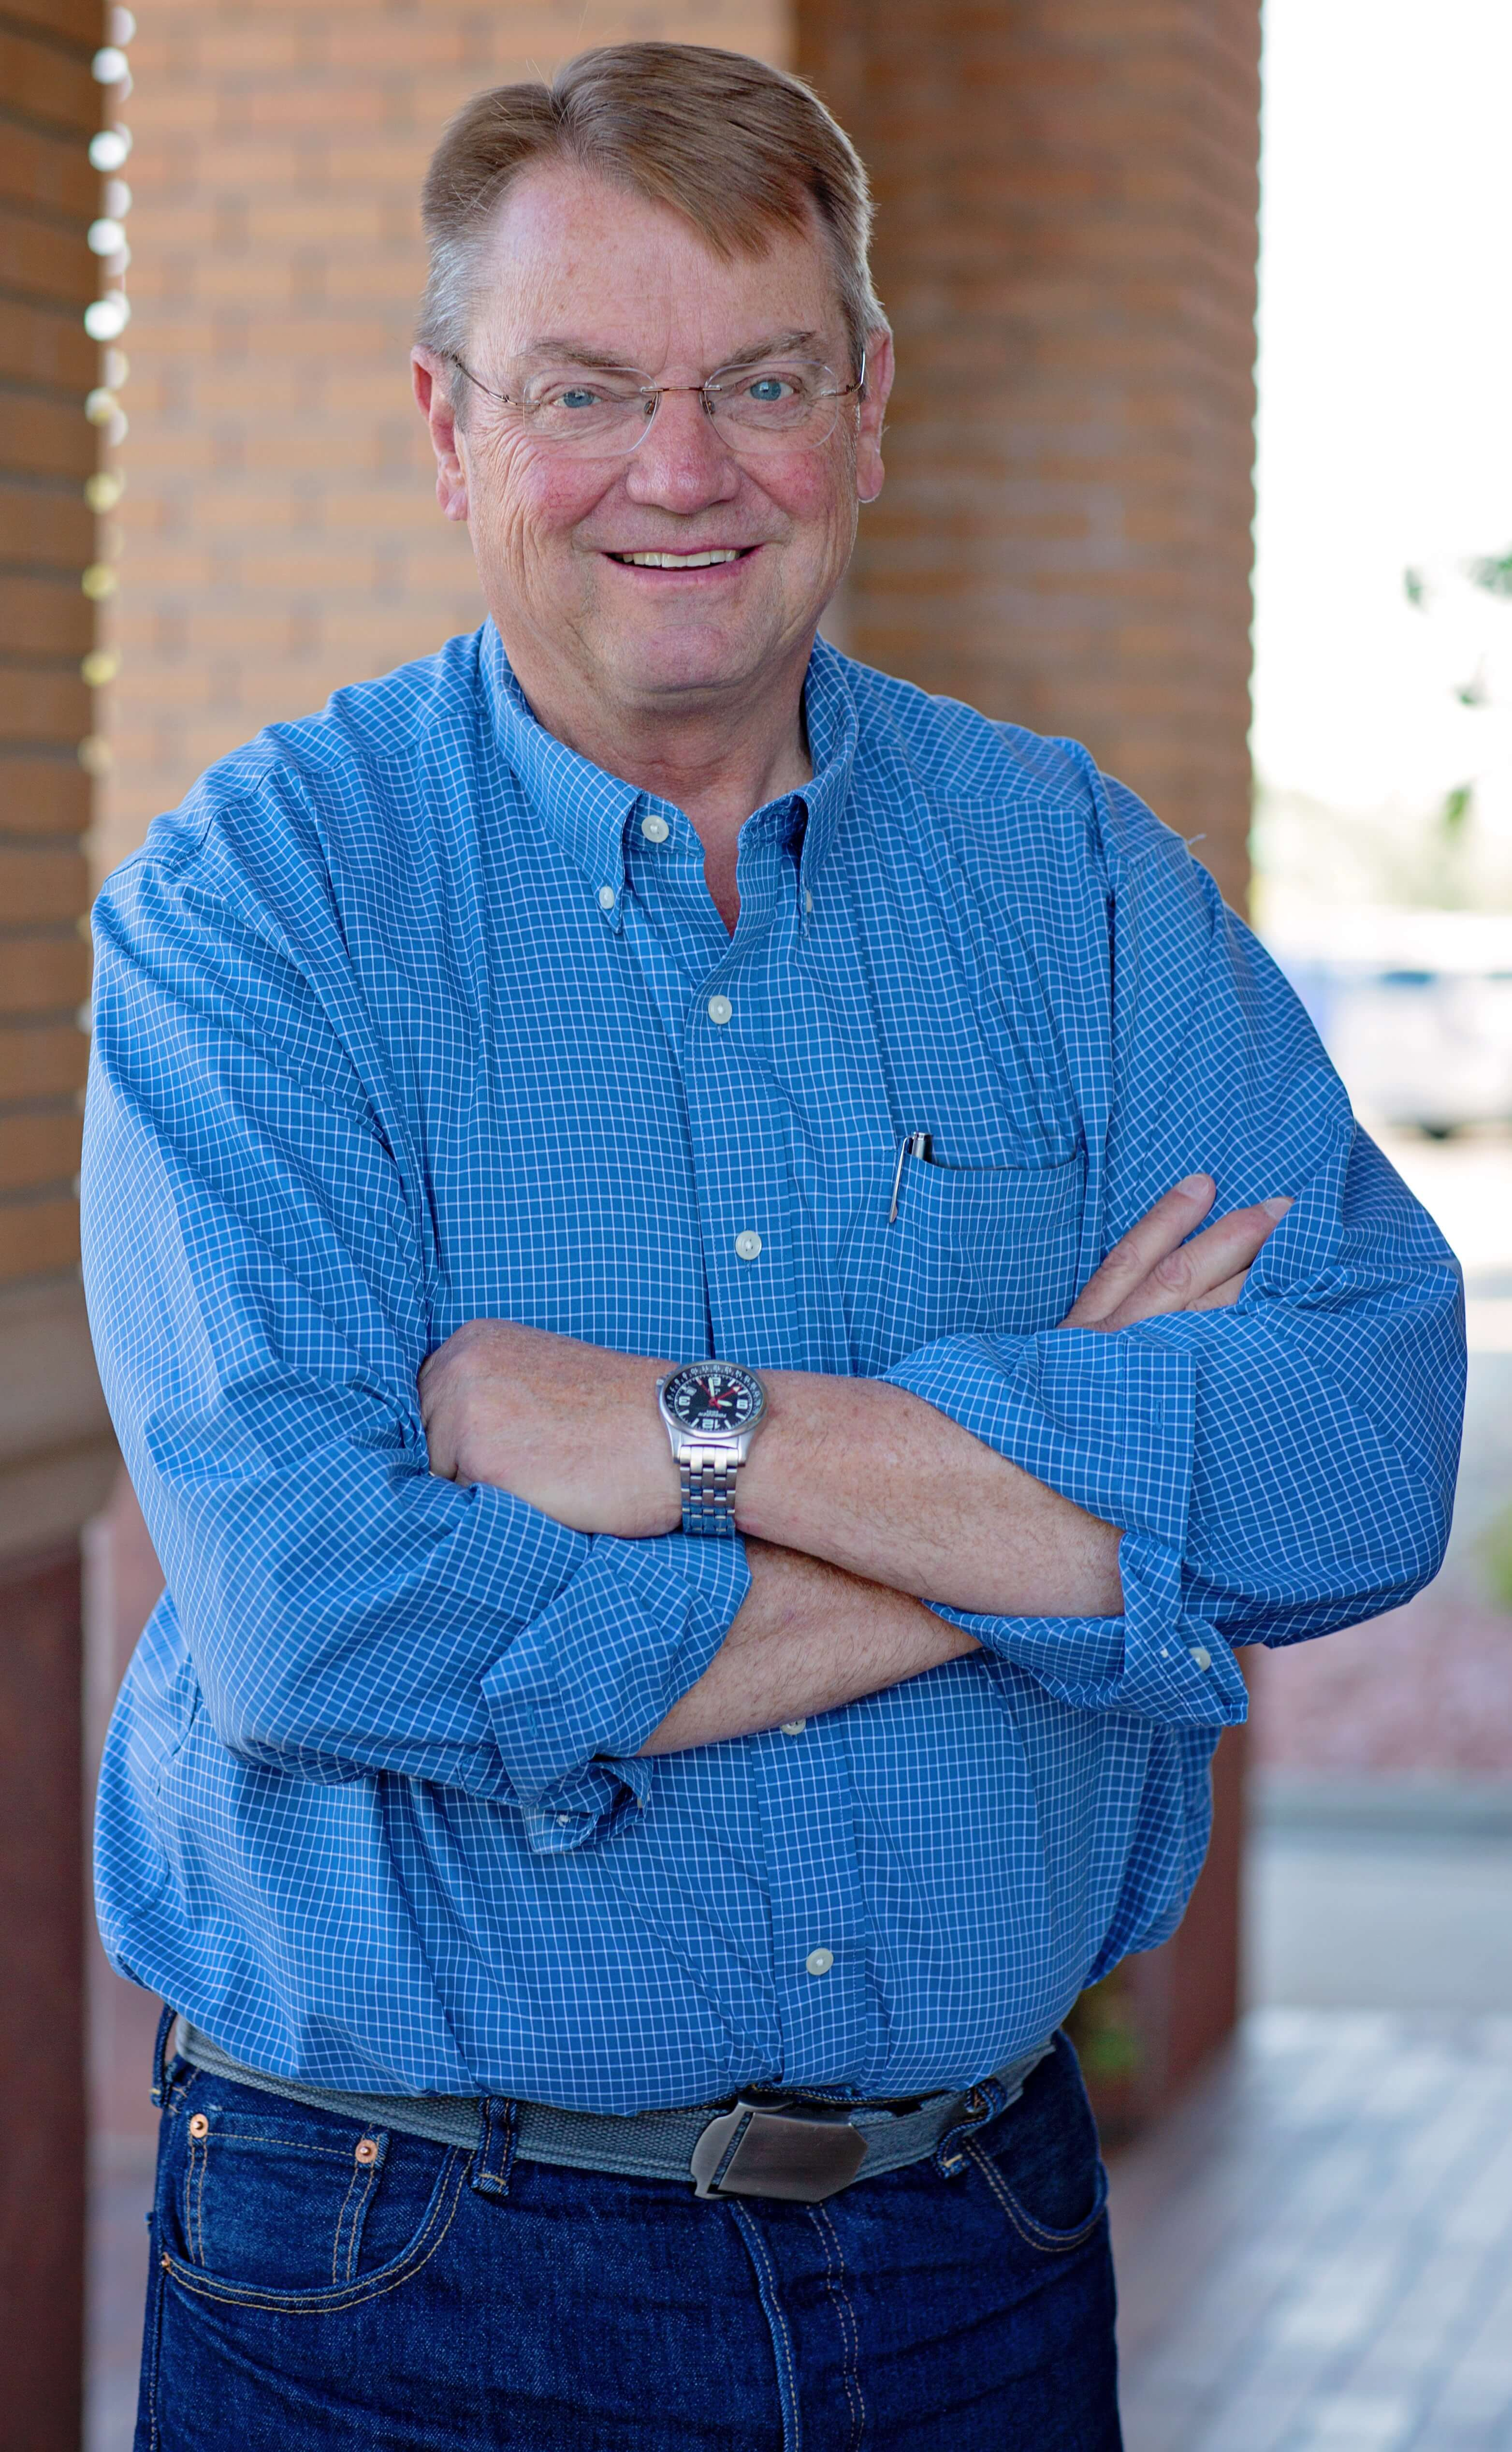 Dr. Tony Euser